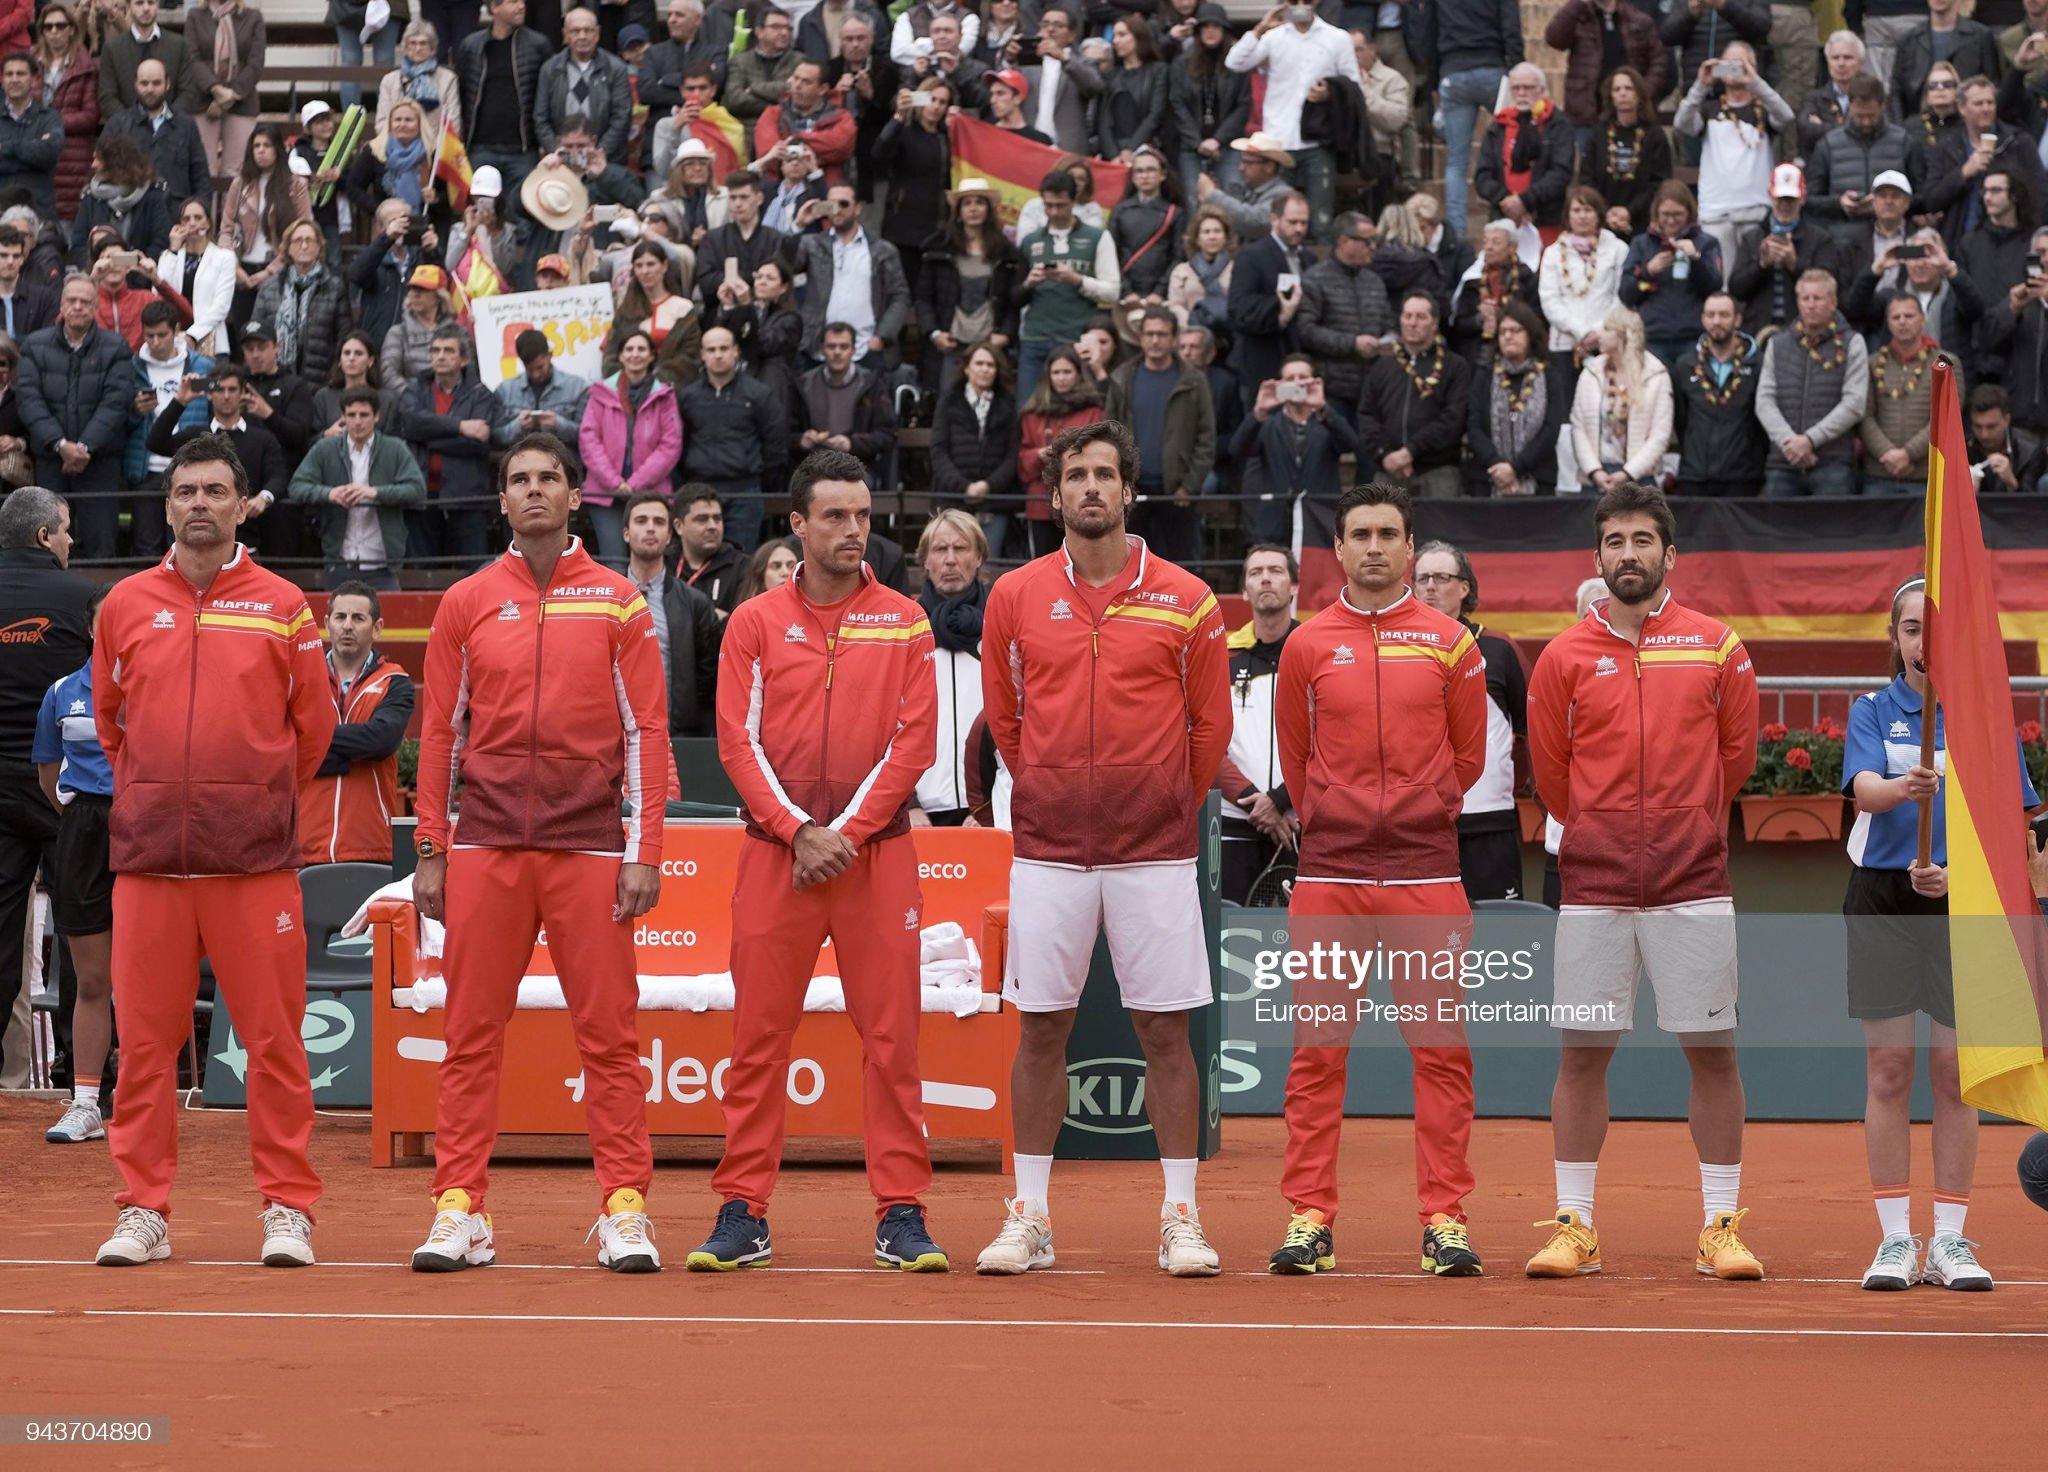 ¿Cuánto mide Roberto Bautista? - Real height The-spanish-team-sergi-bruguera-rafael-nadal-roberto-bautista-agut-picture-id943704890?s=2048x2048